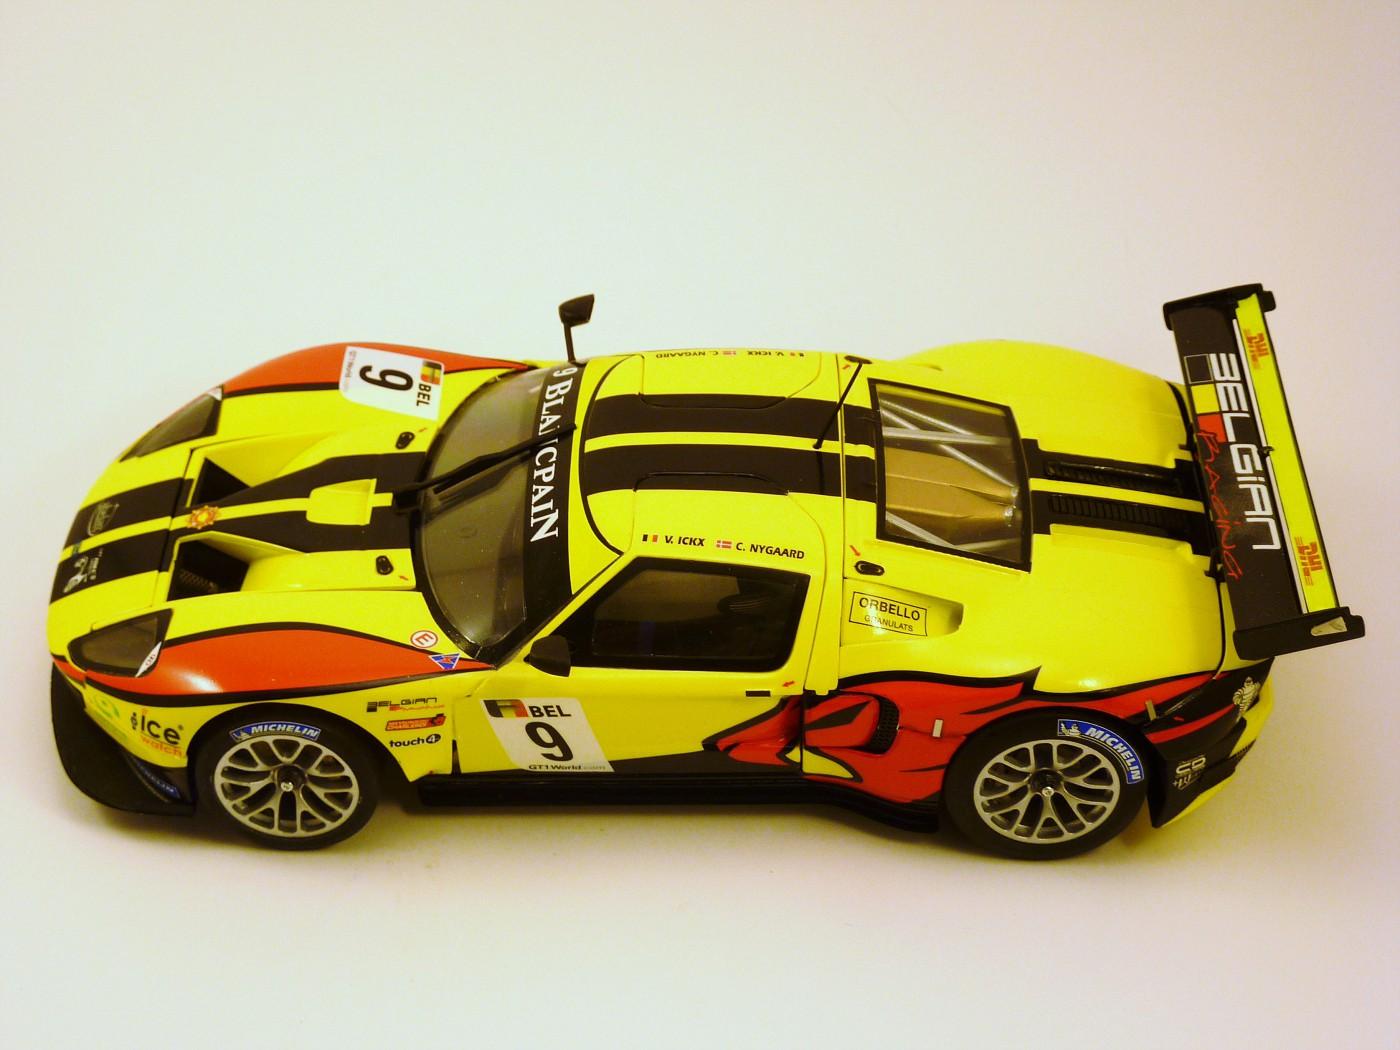 Ford gt1 Belgian racing FinalesFordGt1BelgianRacing004-vi